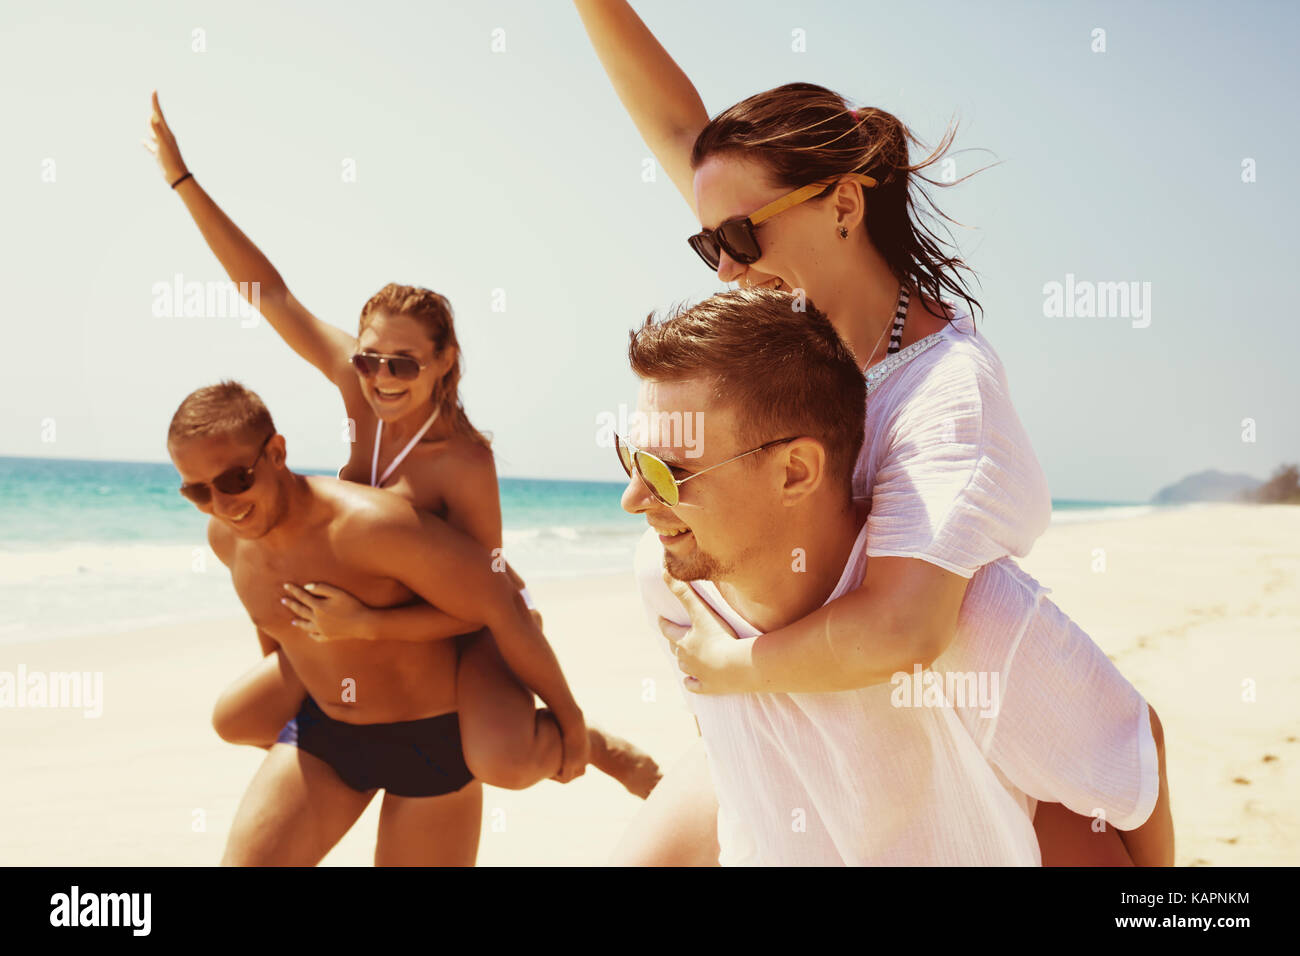 Two couples friends fun beach run - Stock Image